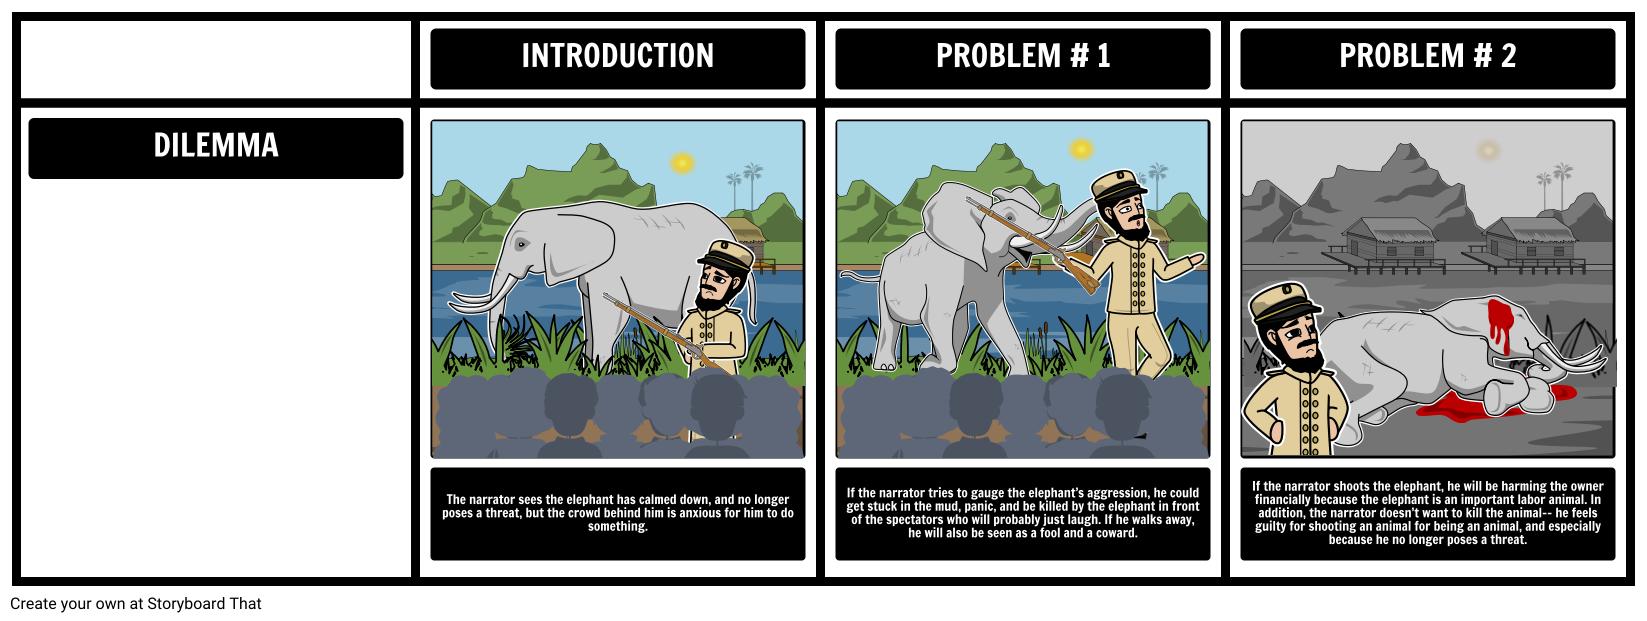 shooting an elephant text